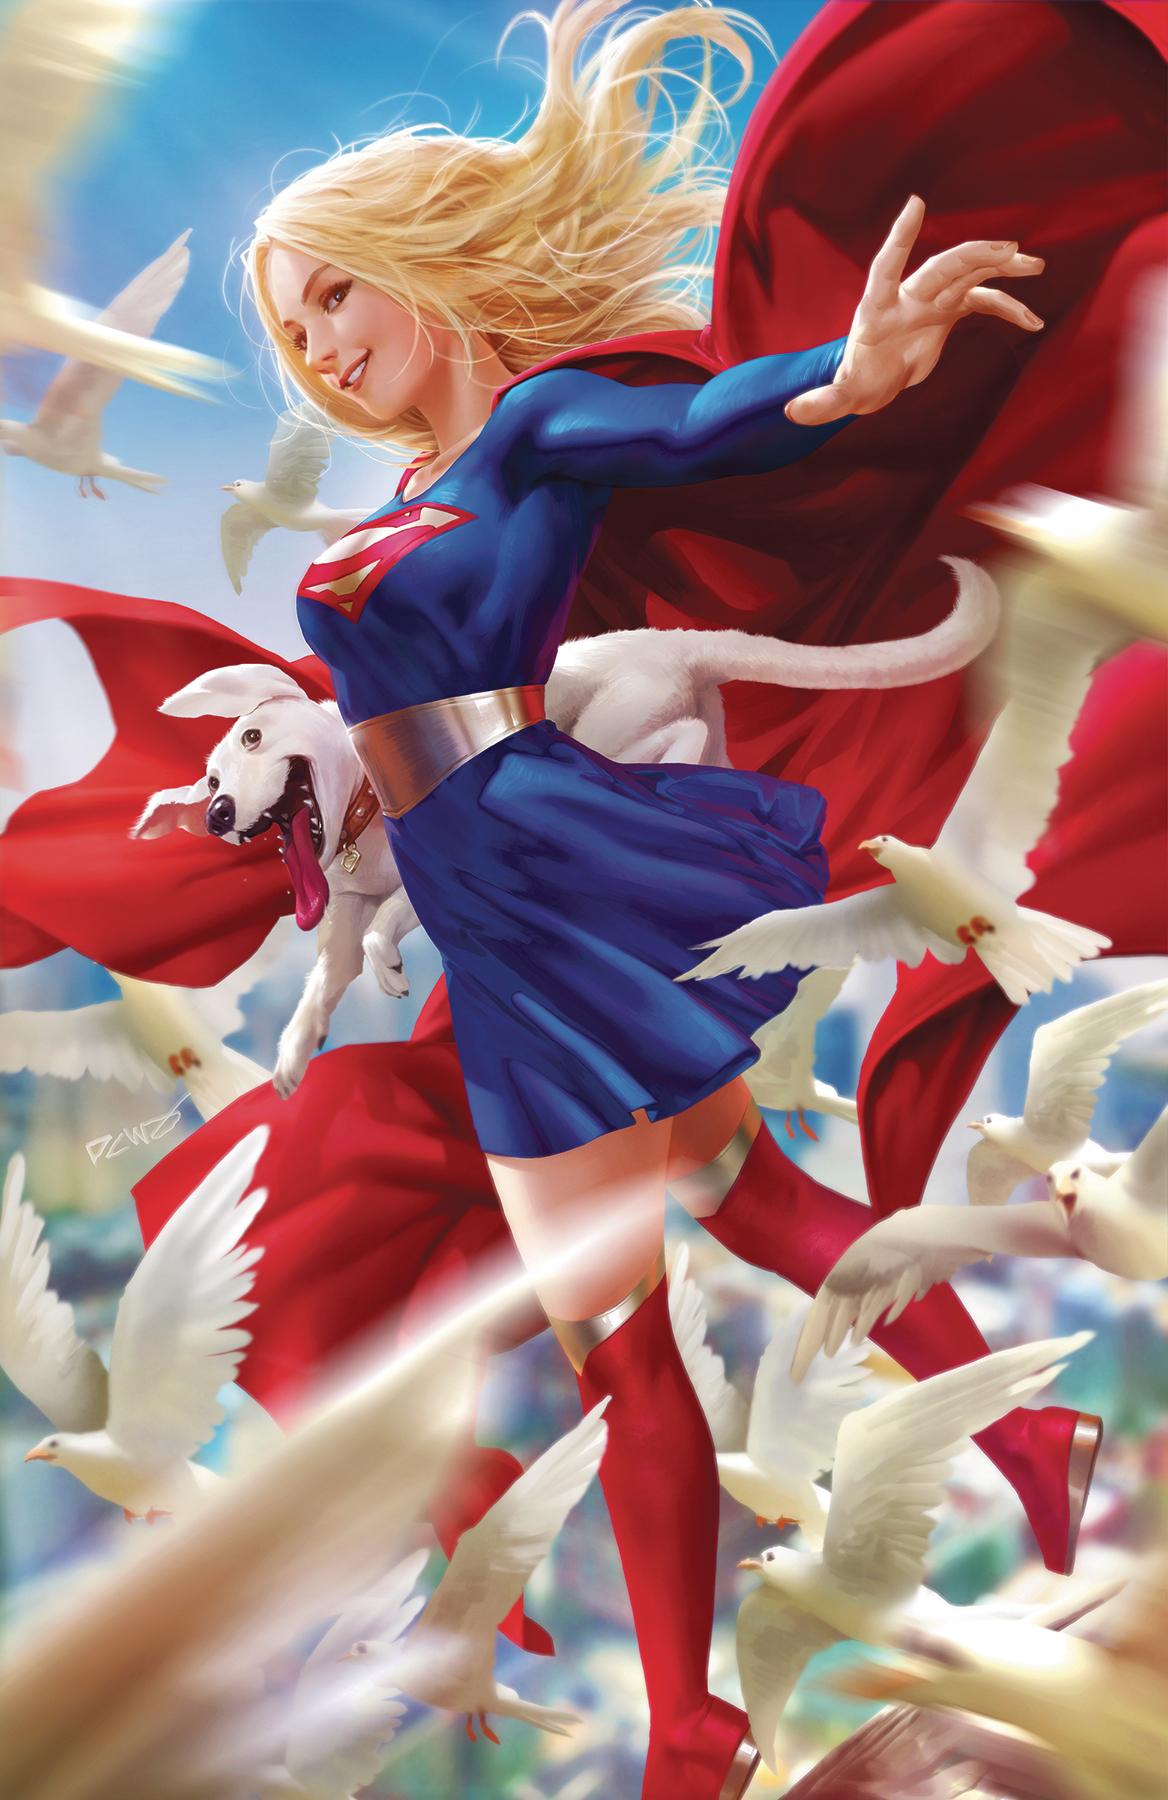 Supergirl Vol 7 34 Textless Variant.jpg